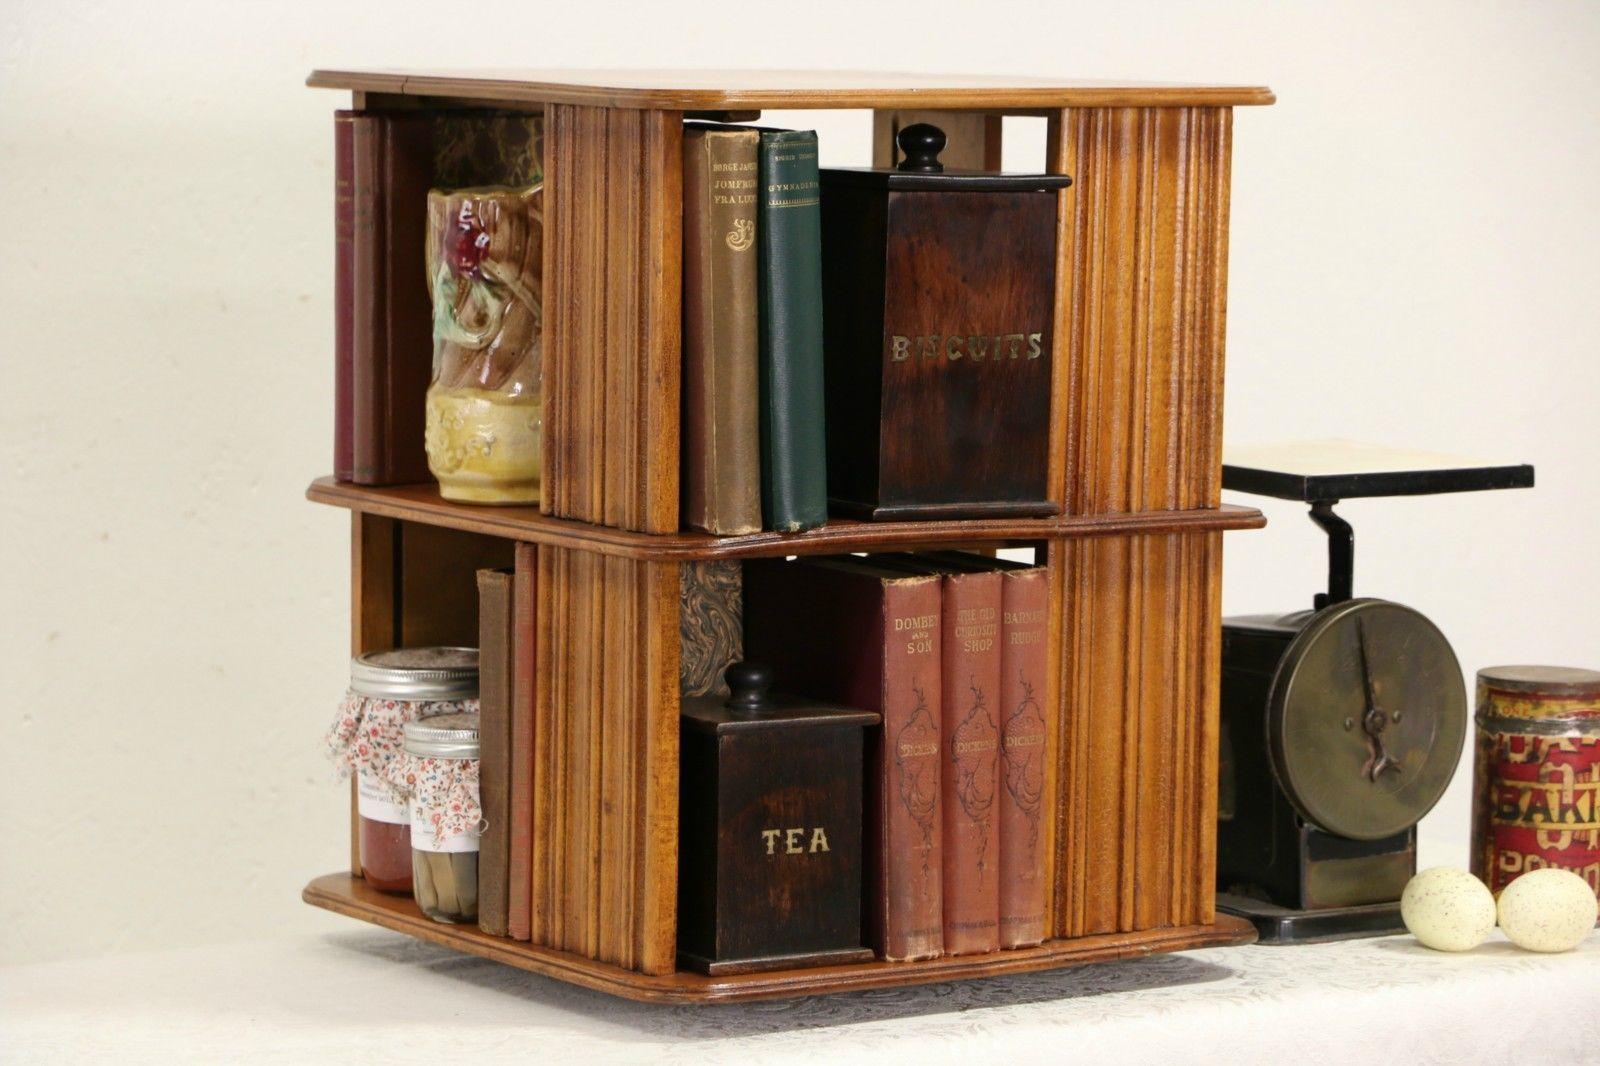 Spinning Bookcase, 1890u0027s Antique Chairside Or Tabletop Revolving Bookshelf